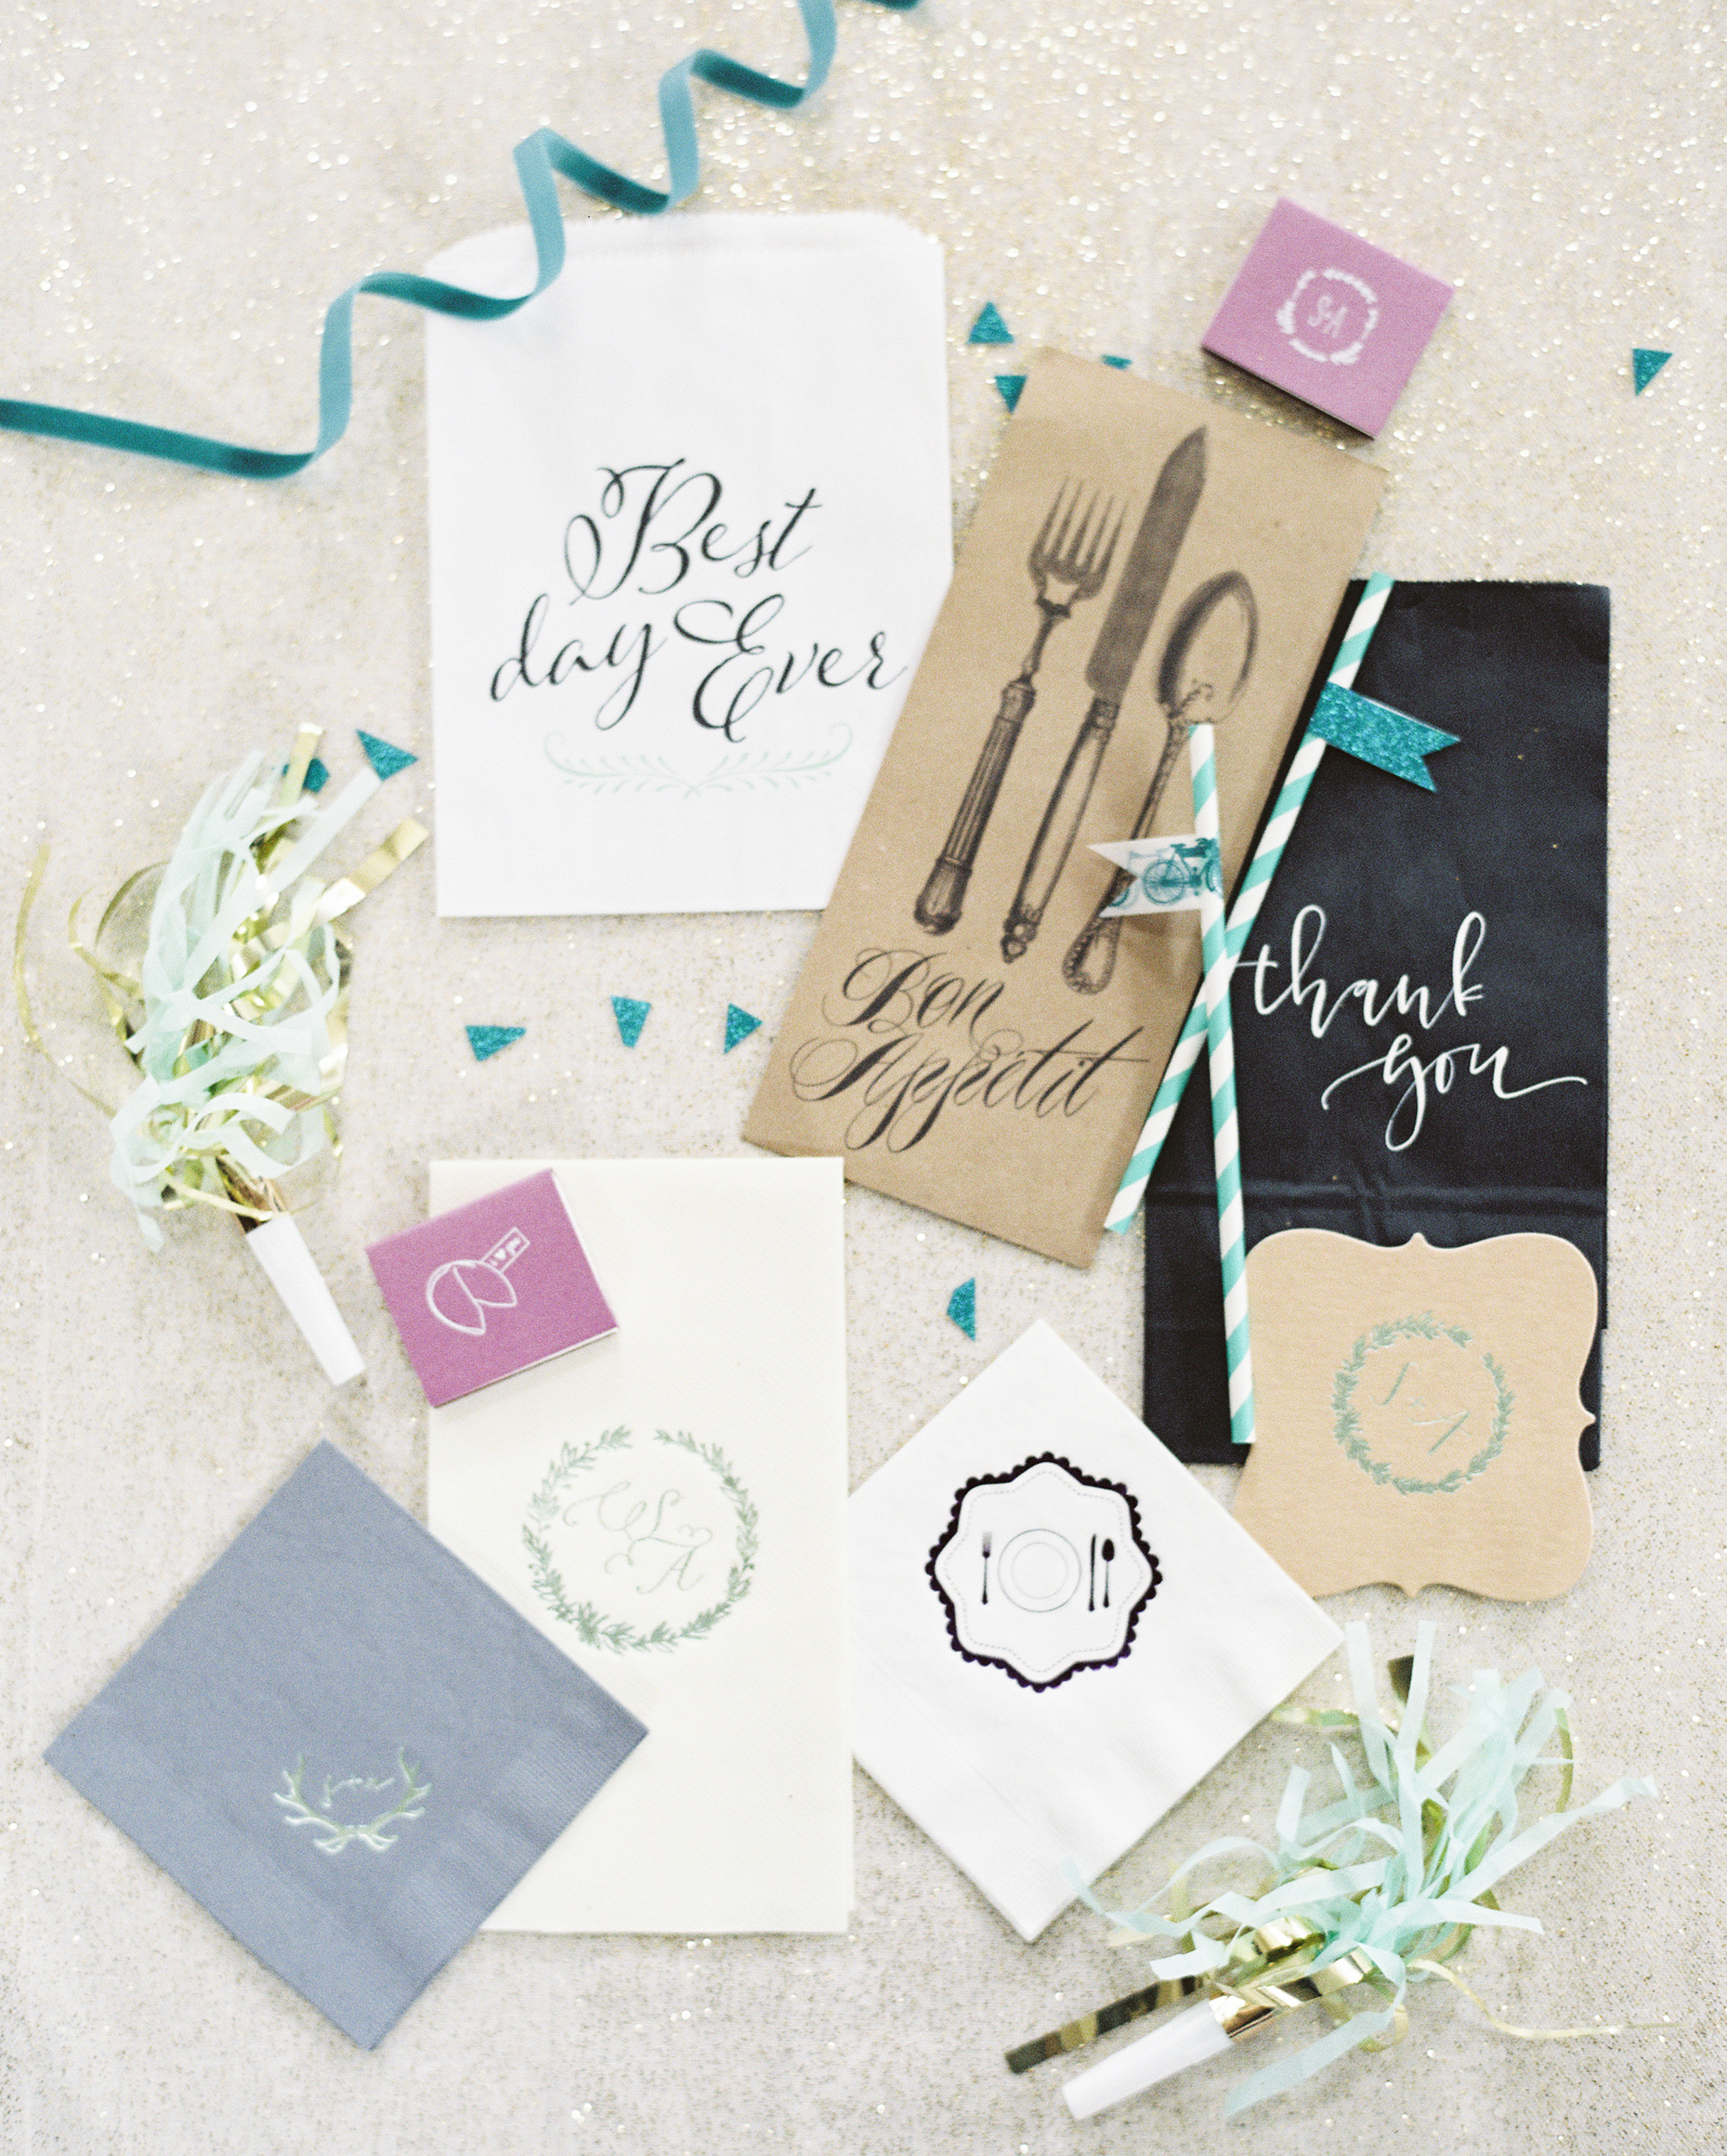 stacey-adam-wedding-paperie-0007-s112112-0815.jpg